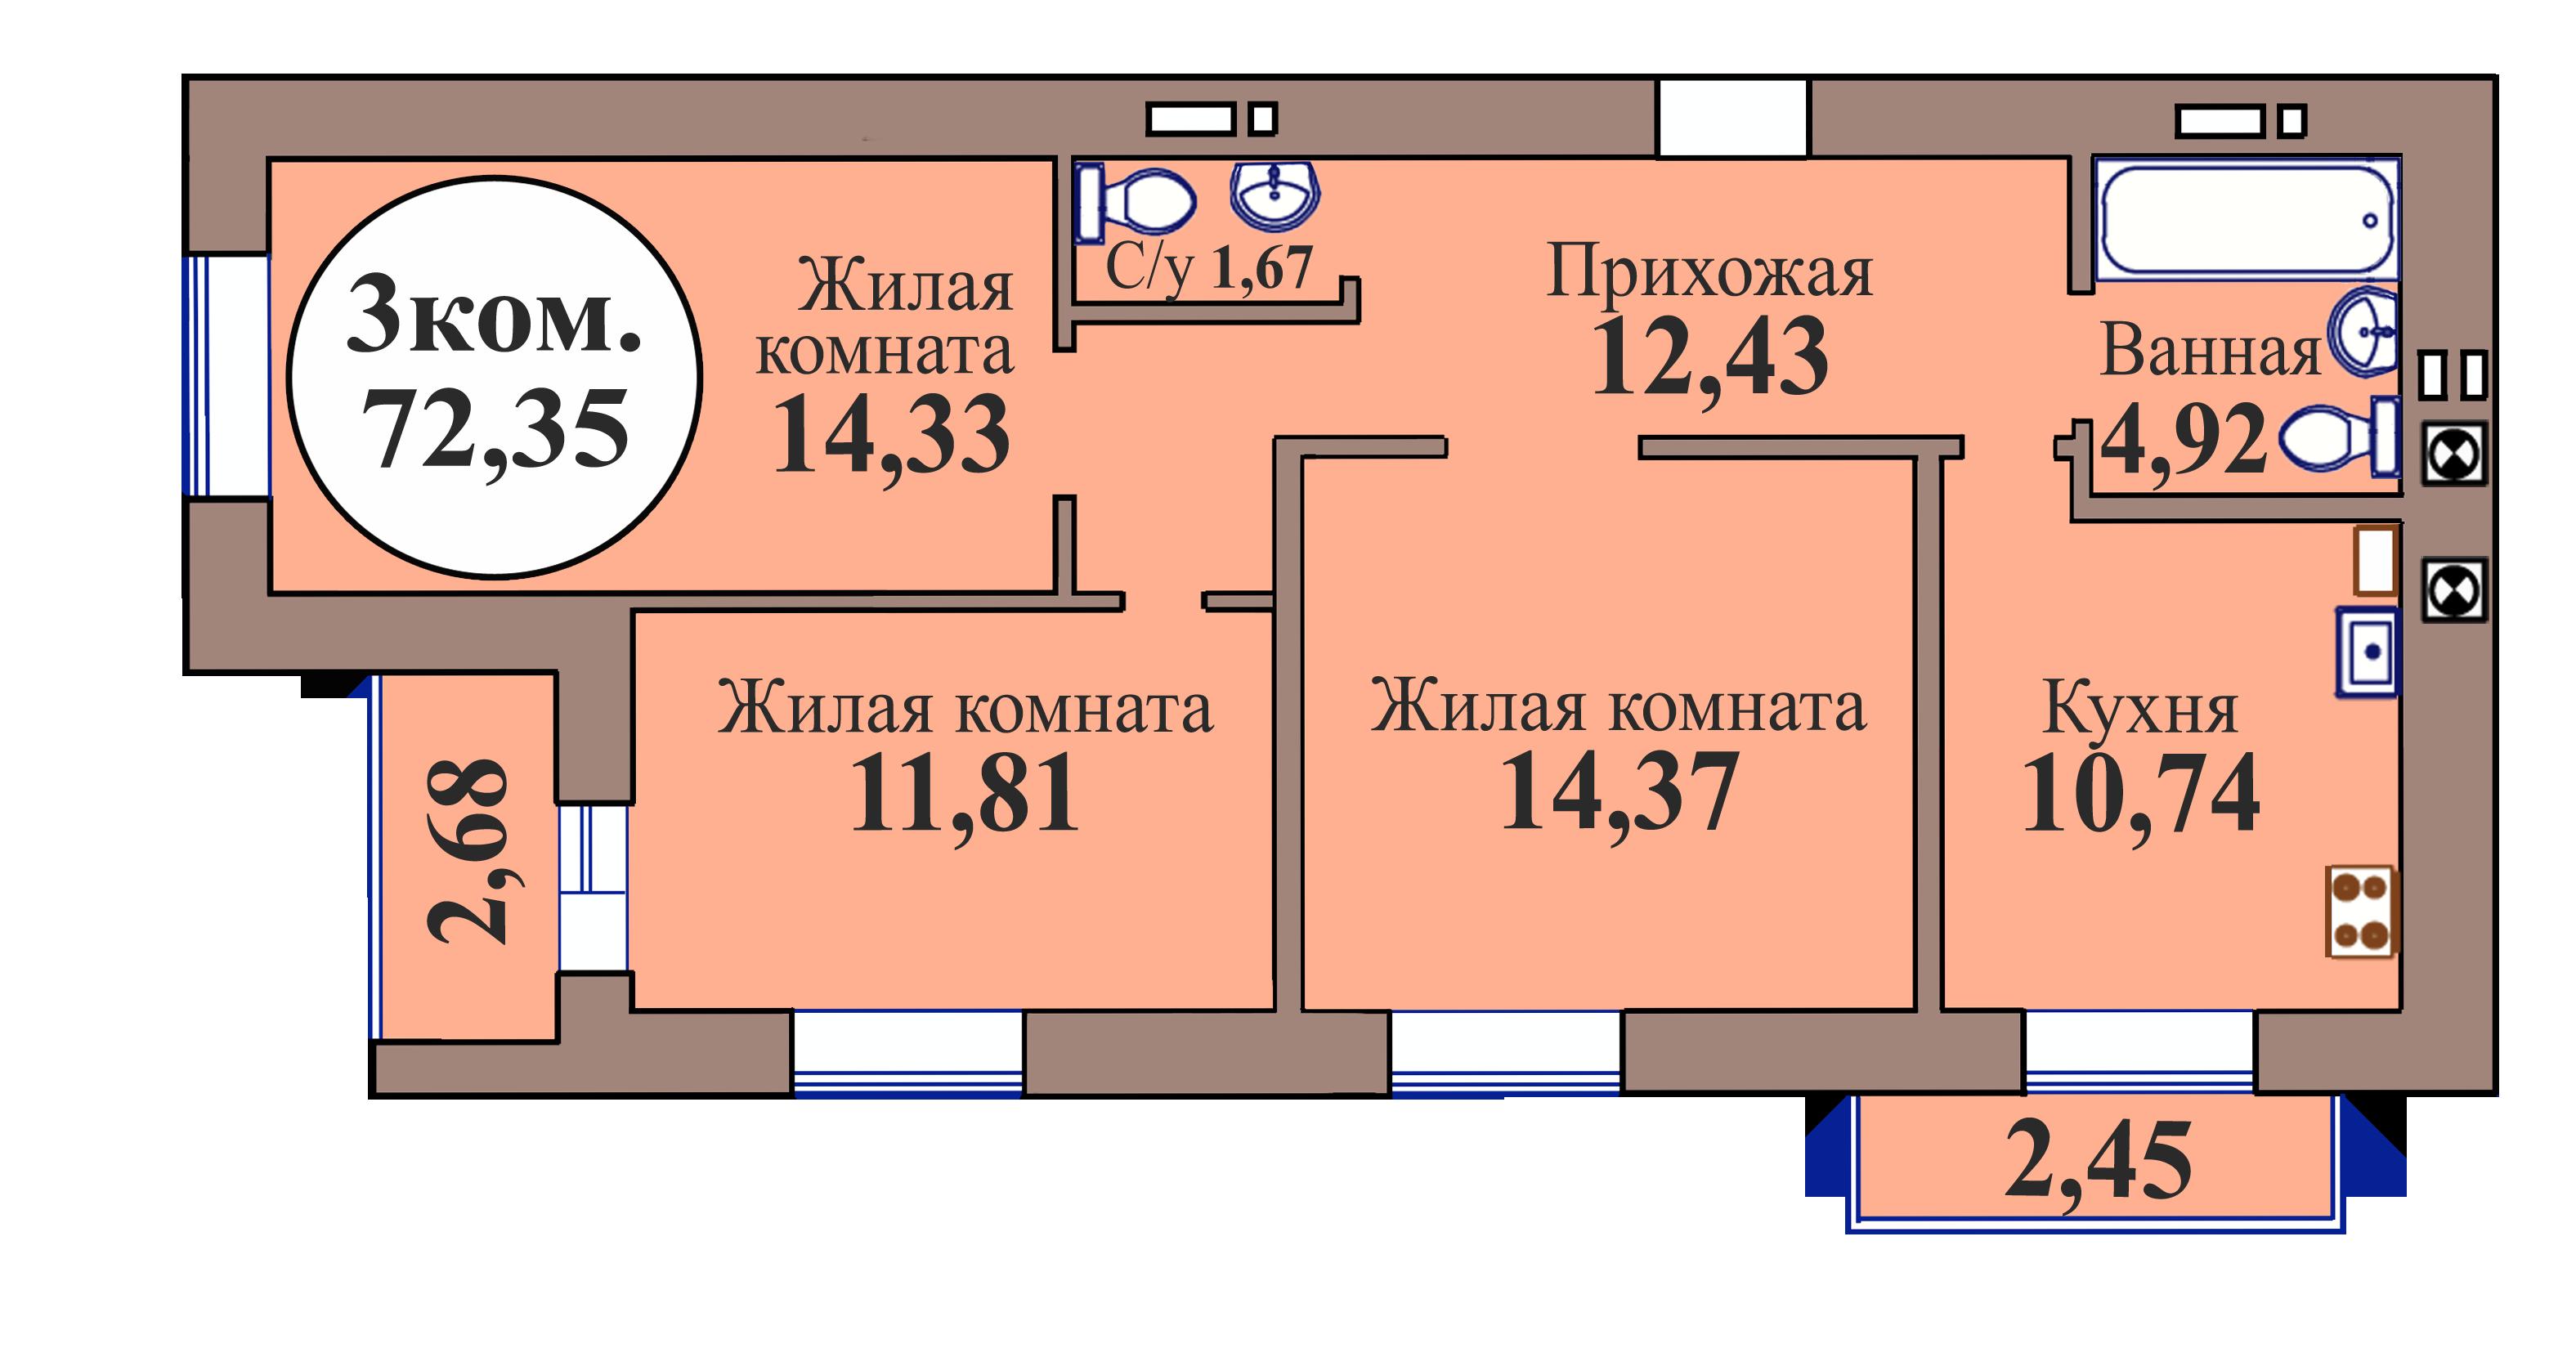 3-комн. кв. по пер. Калининградский, 5 кв. 206 в Калининграде